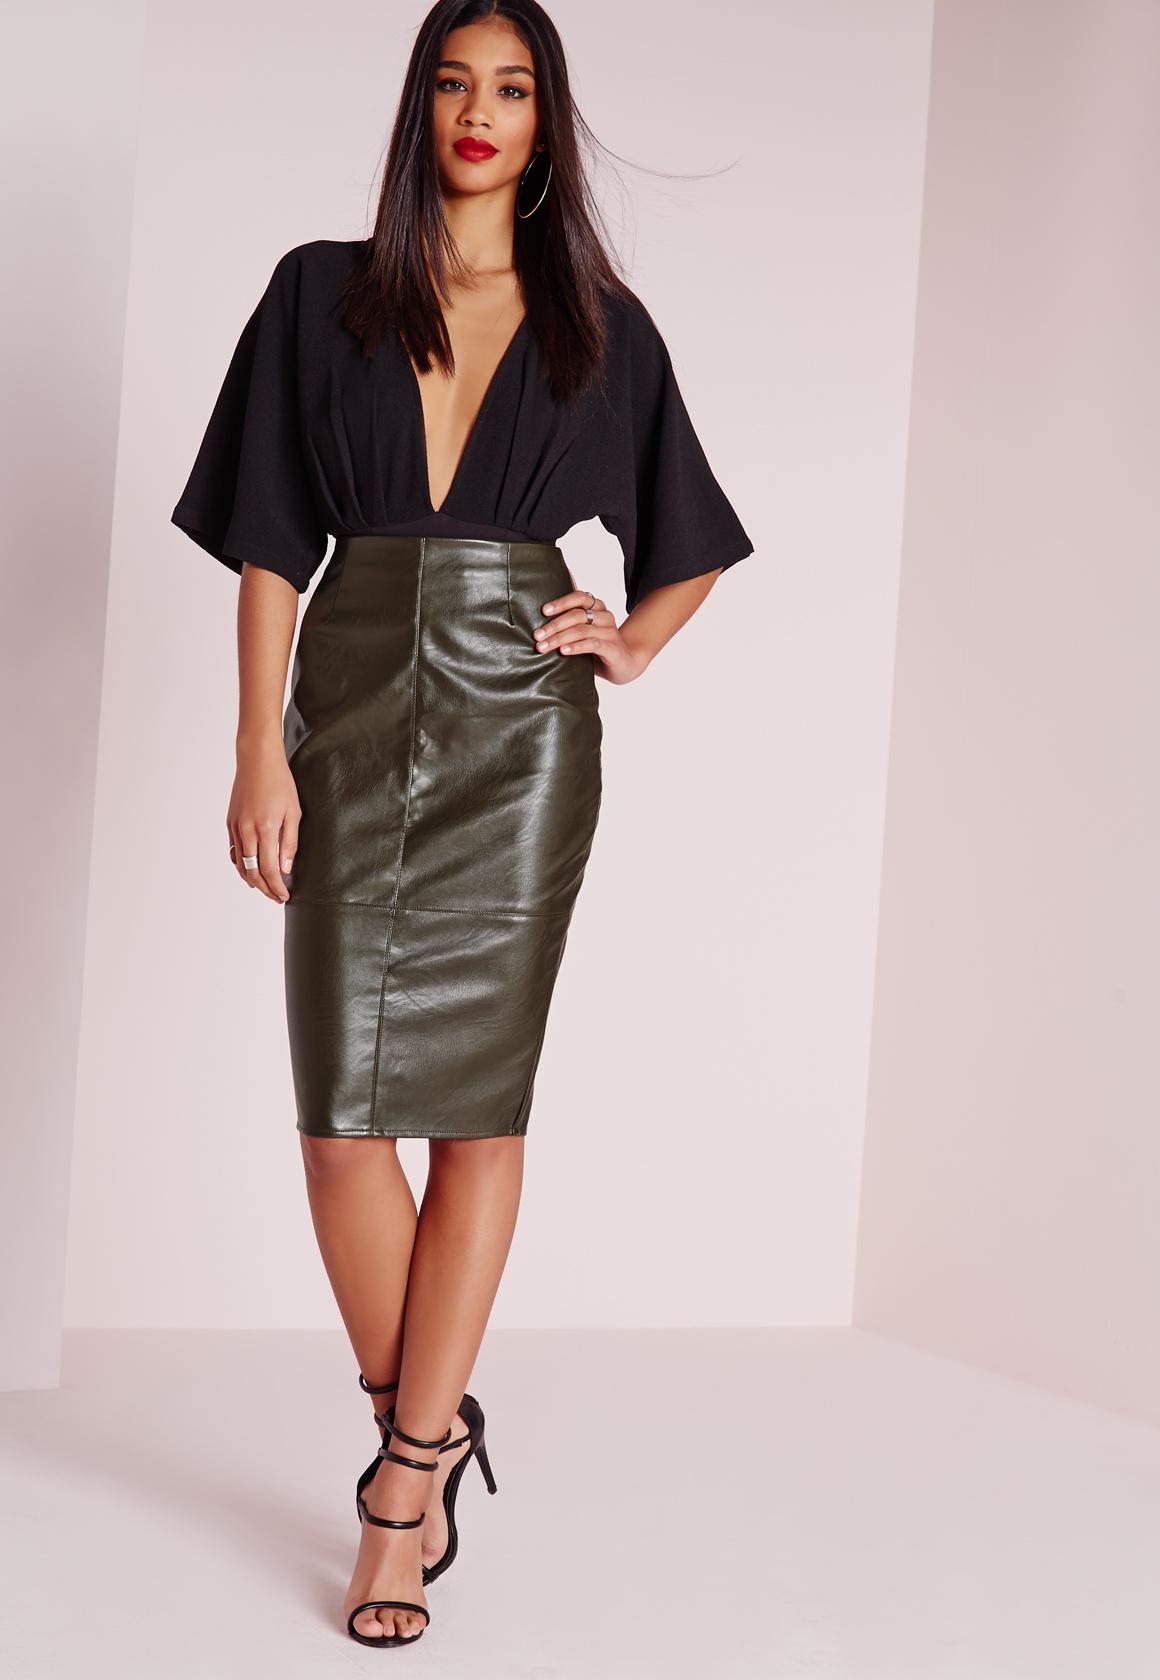 6b393c5ed4 Missguided Faux Leather Seam Detail Midi Skirt Khaki in Natural - Lyst